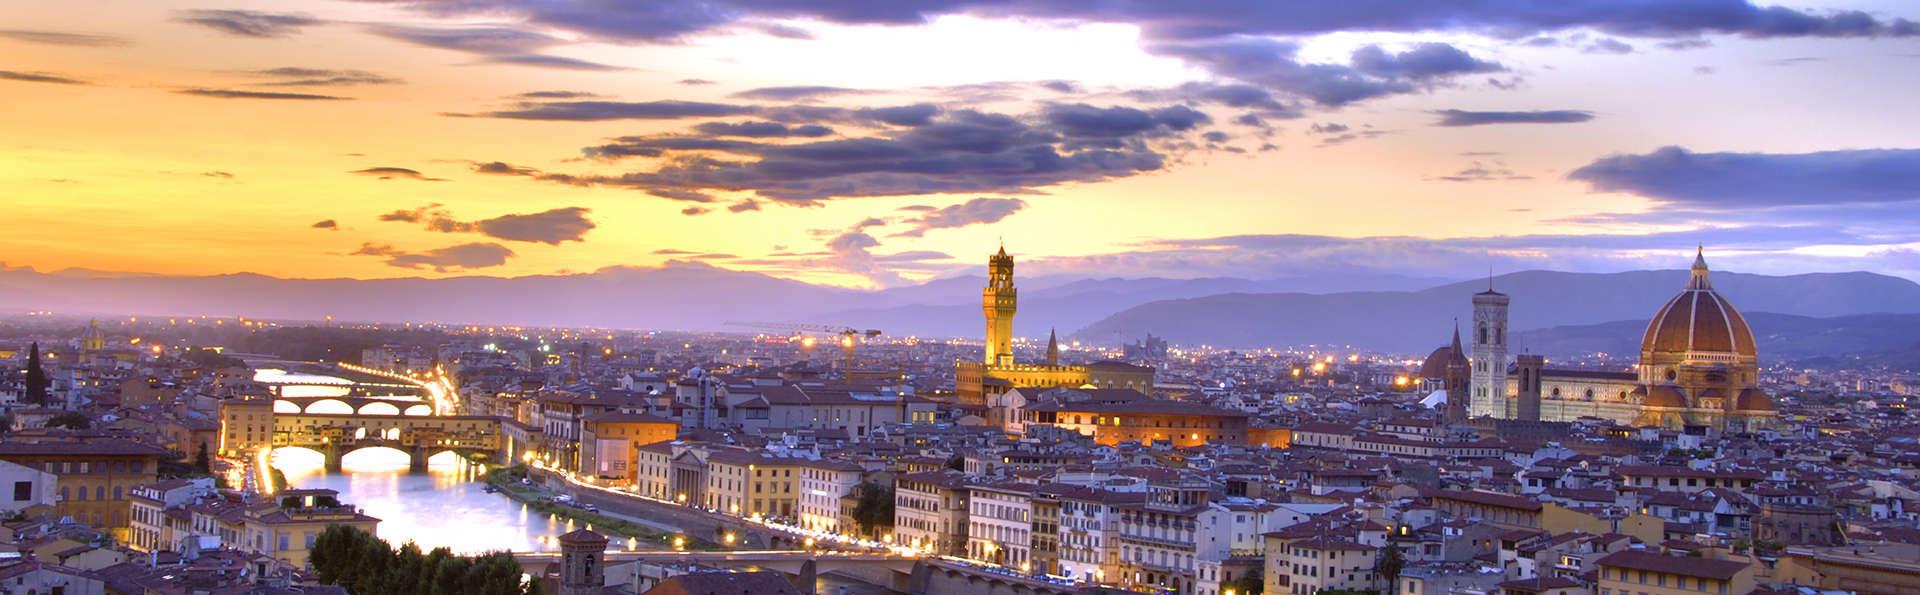 Residence Chianti Village Morrocco - Edit_Firenze5.jpg